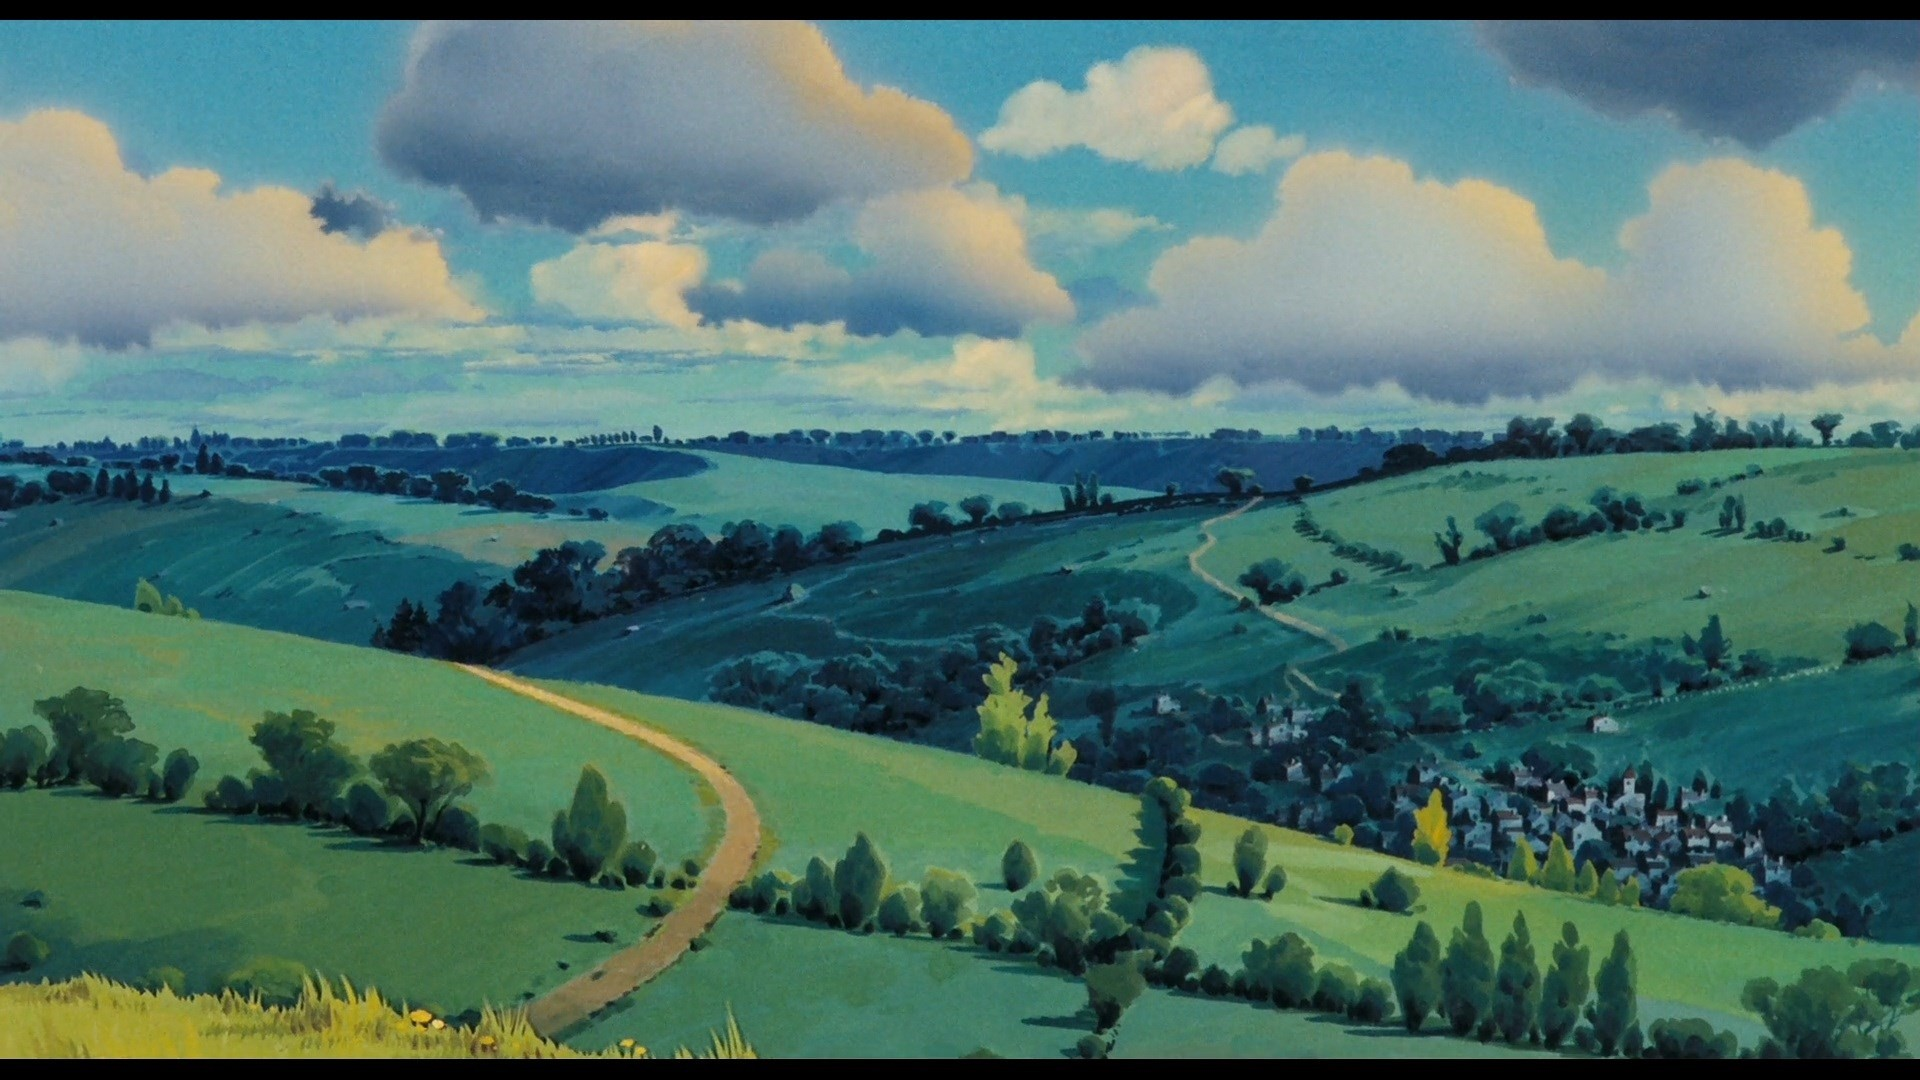 Ghibli hd desktop wallpaper